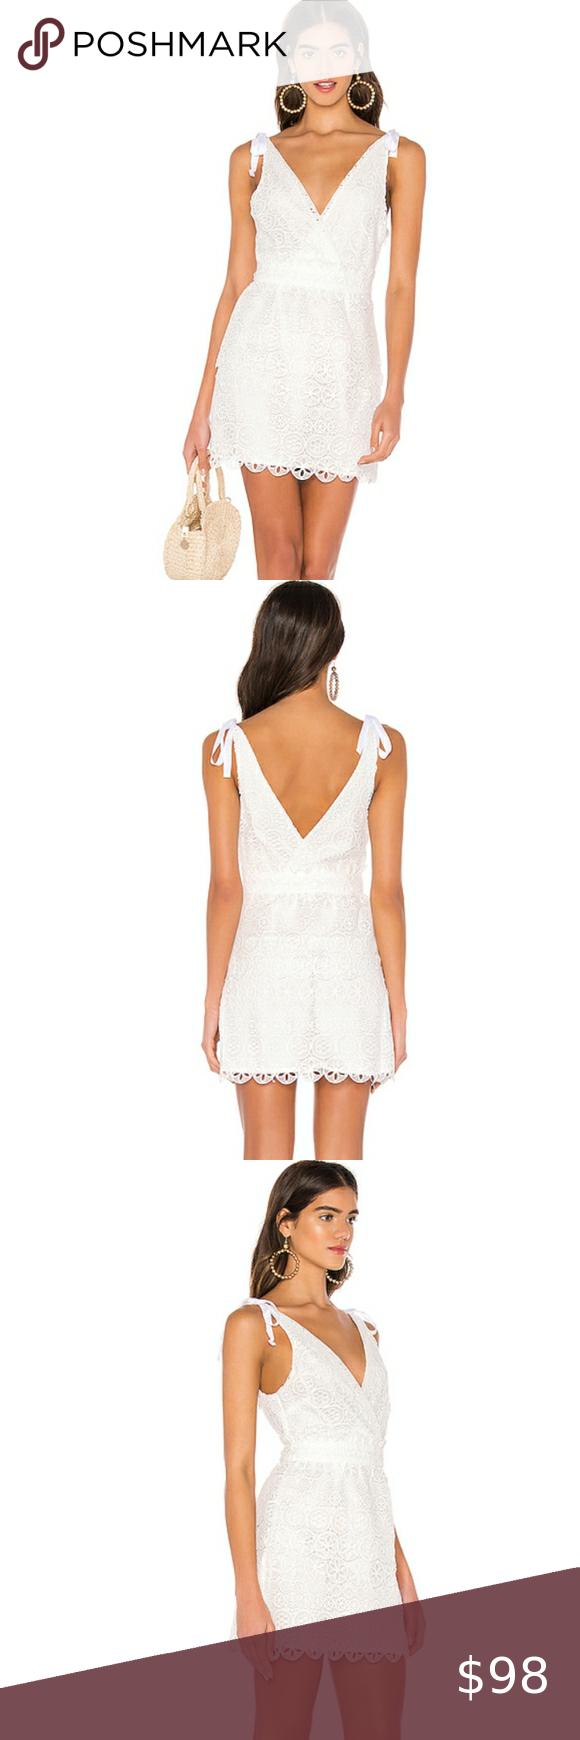 Majorelle Juliette White Lace Tie Straps Dress M Revolve Majorelle Juliette Tie Straps Medium White Lace Dress Nwt Lace White Dress Tie Strap Dress Strap Dress [ 1740 x 580 Pixel ]